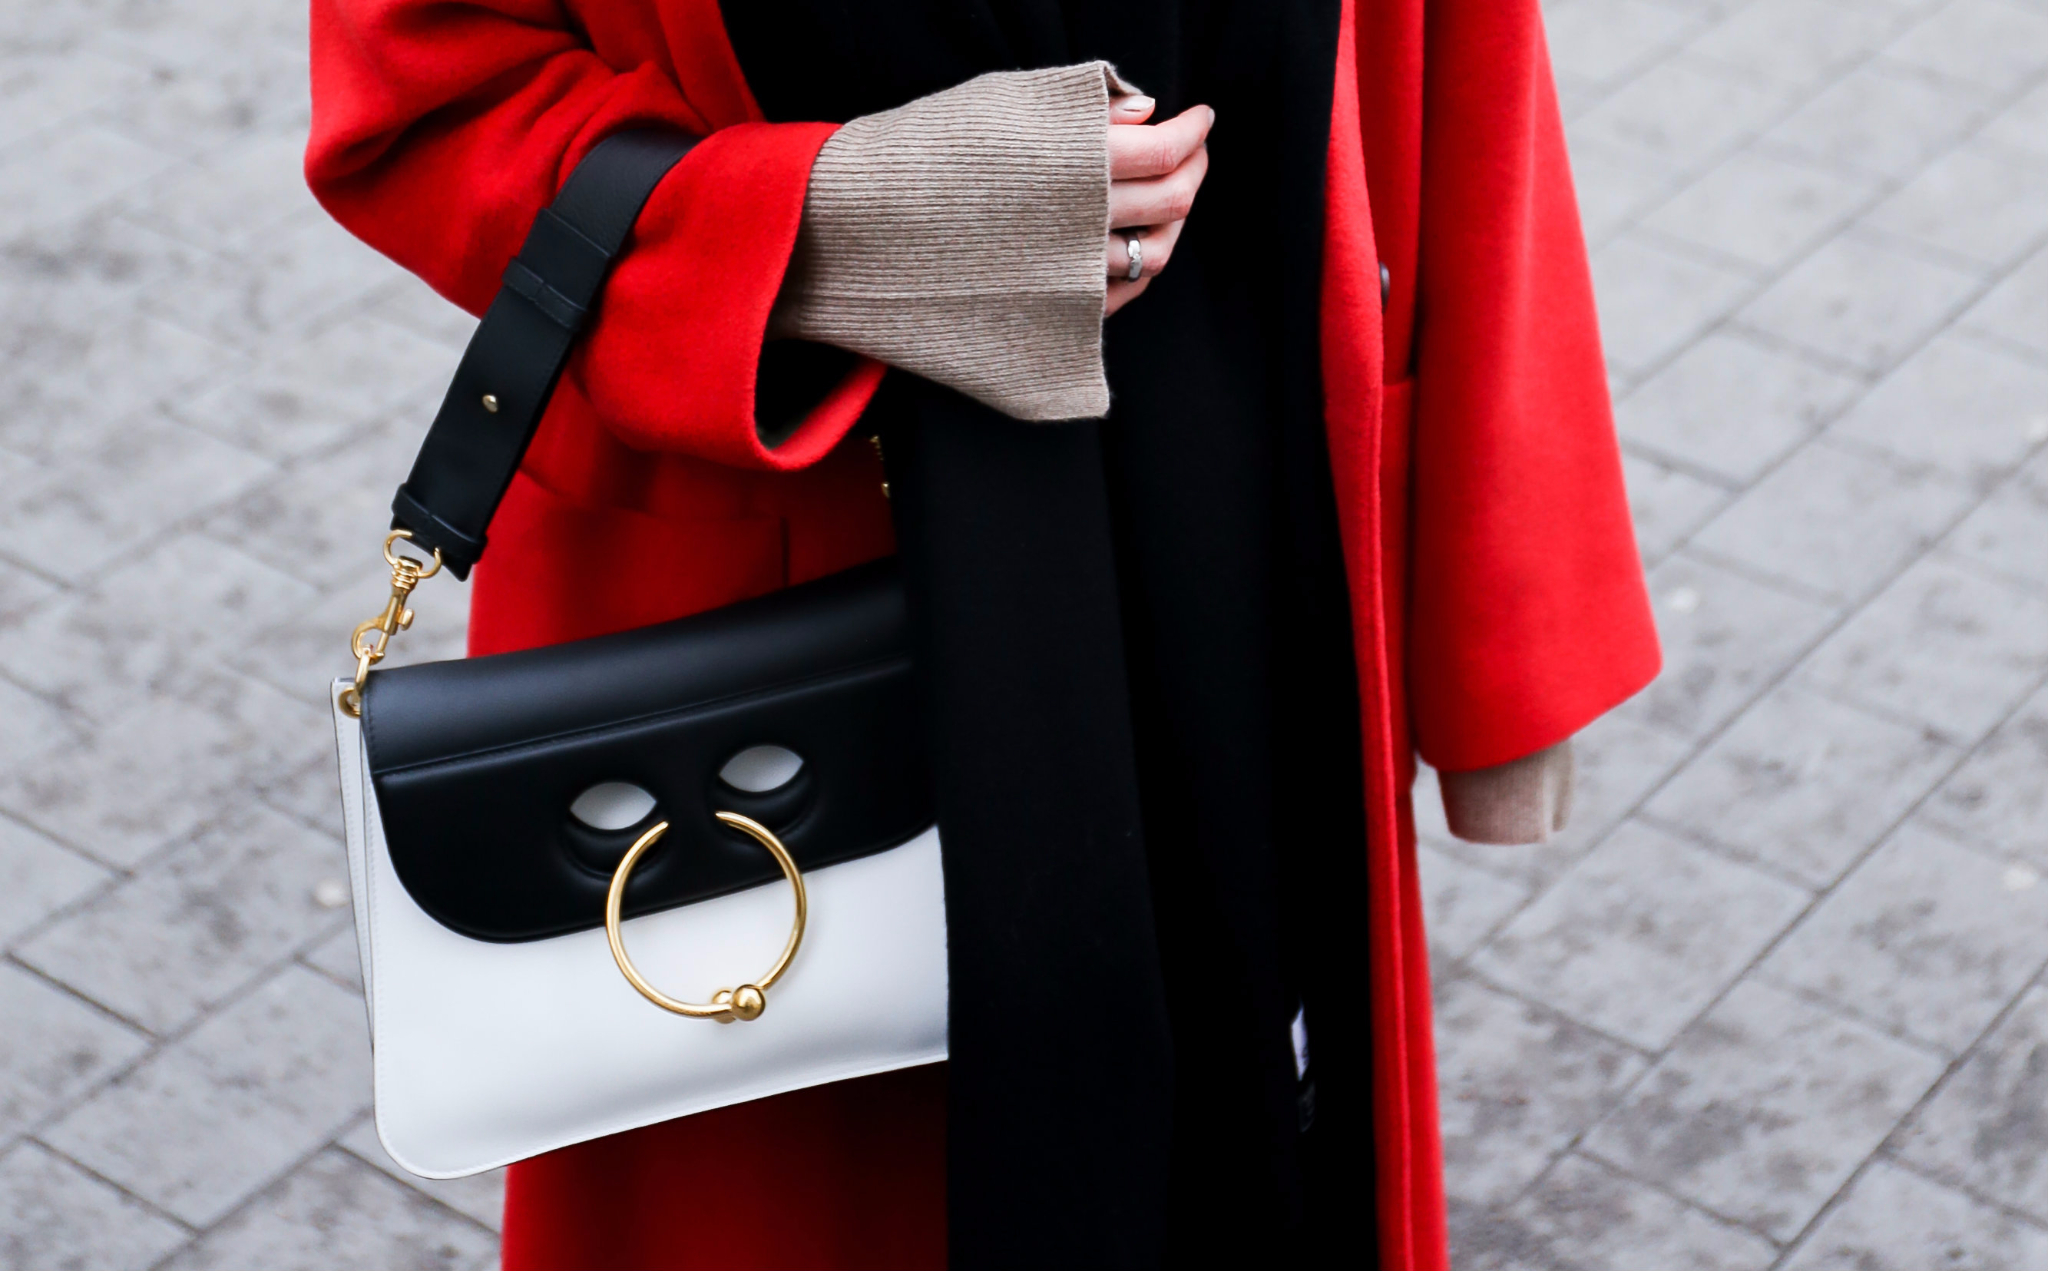 MOD-by-Monique-Fashion-Looks-MBFWB-Look-#2-19-1